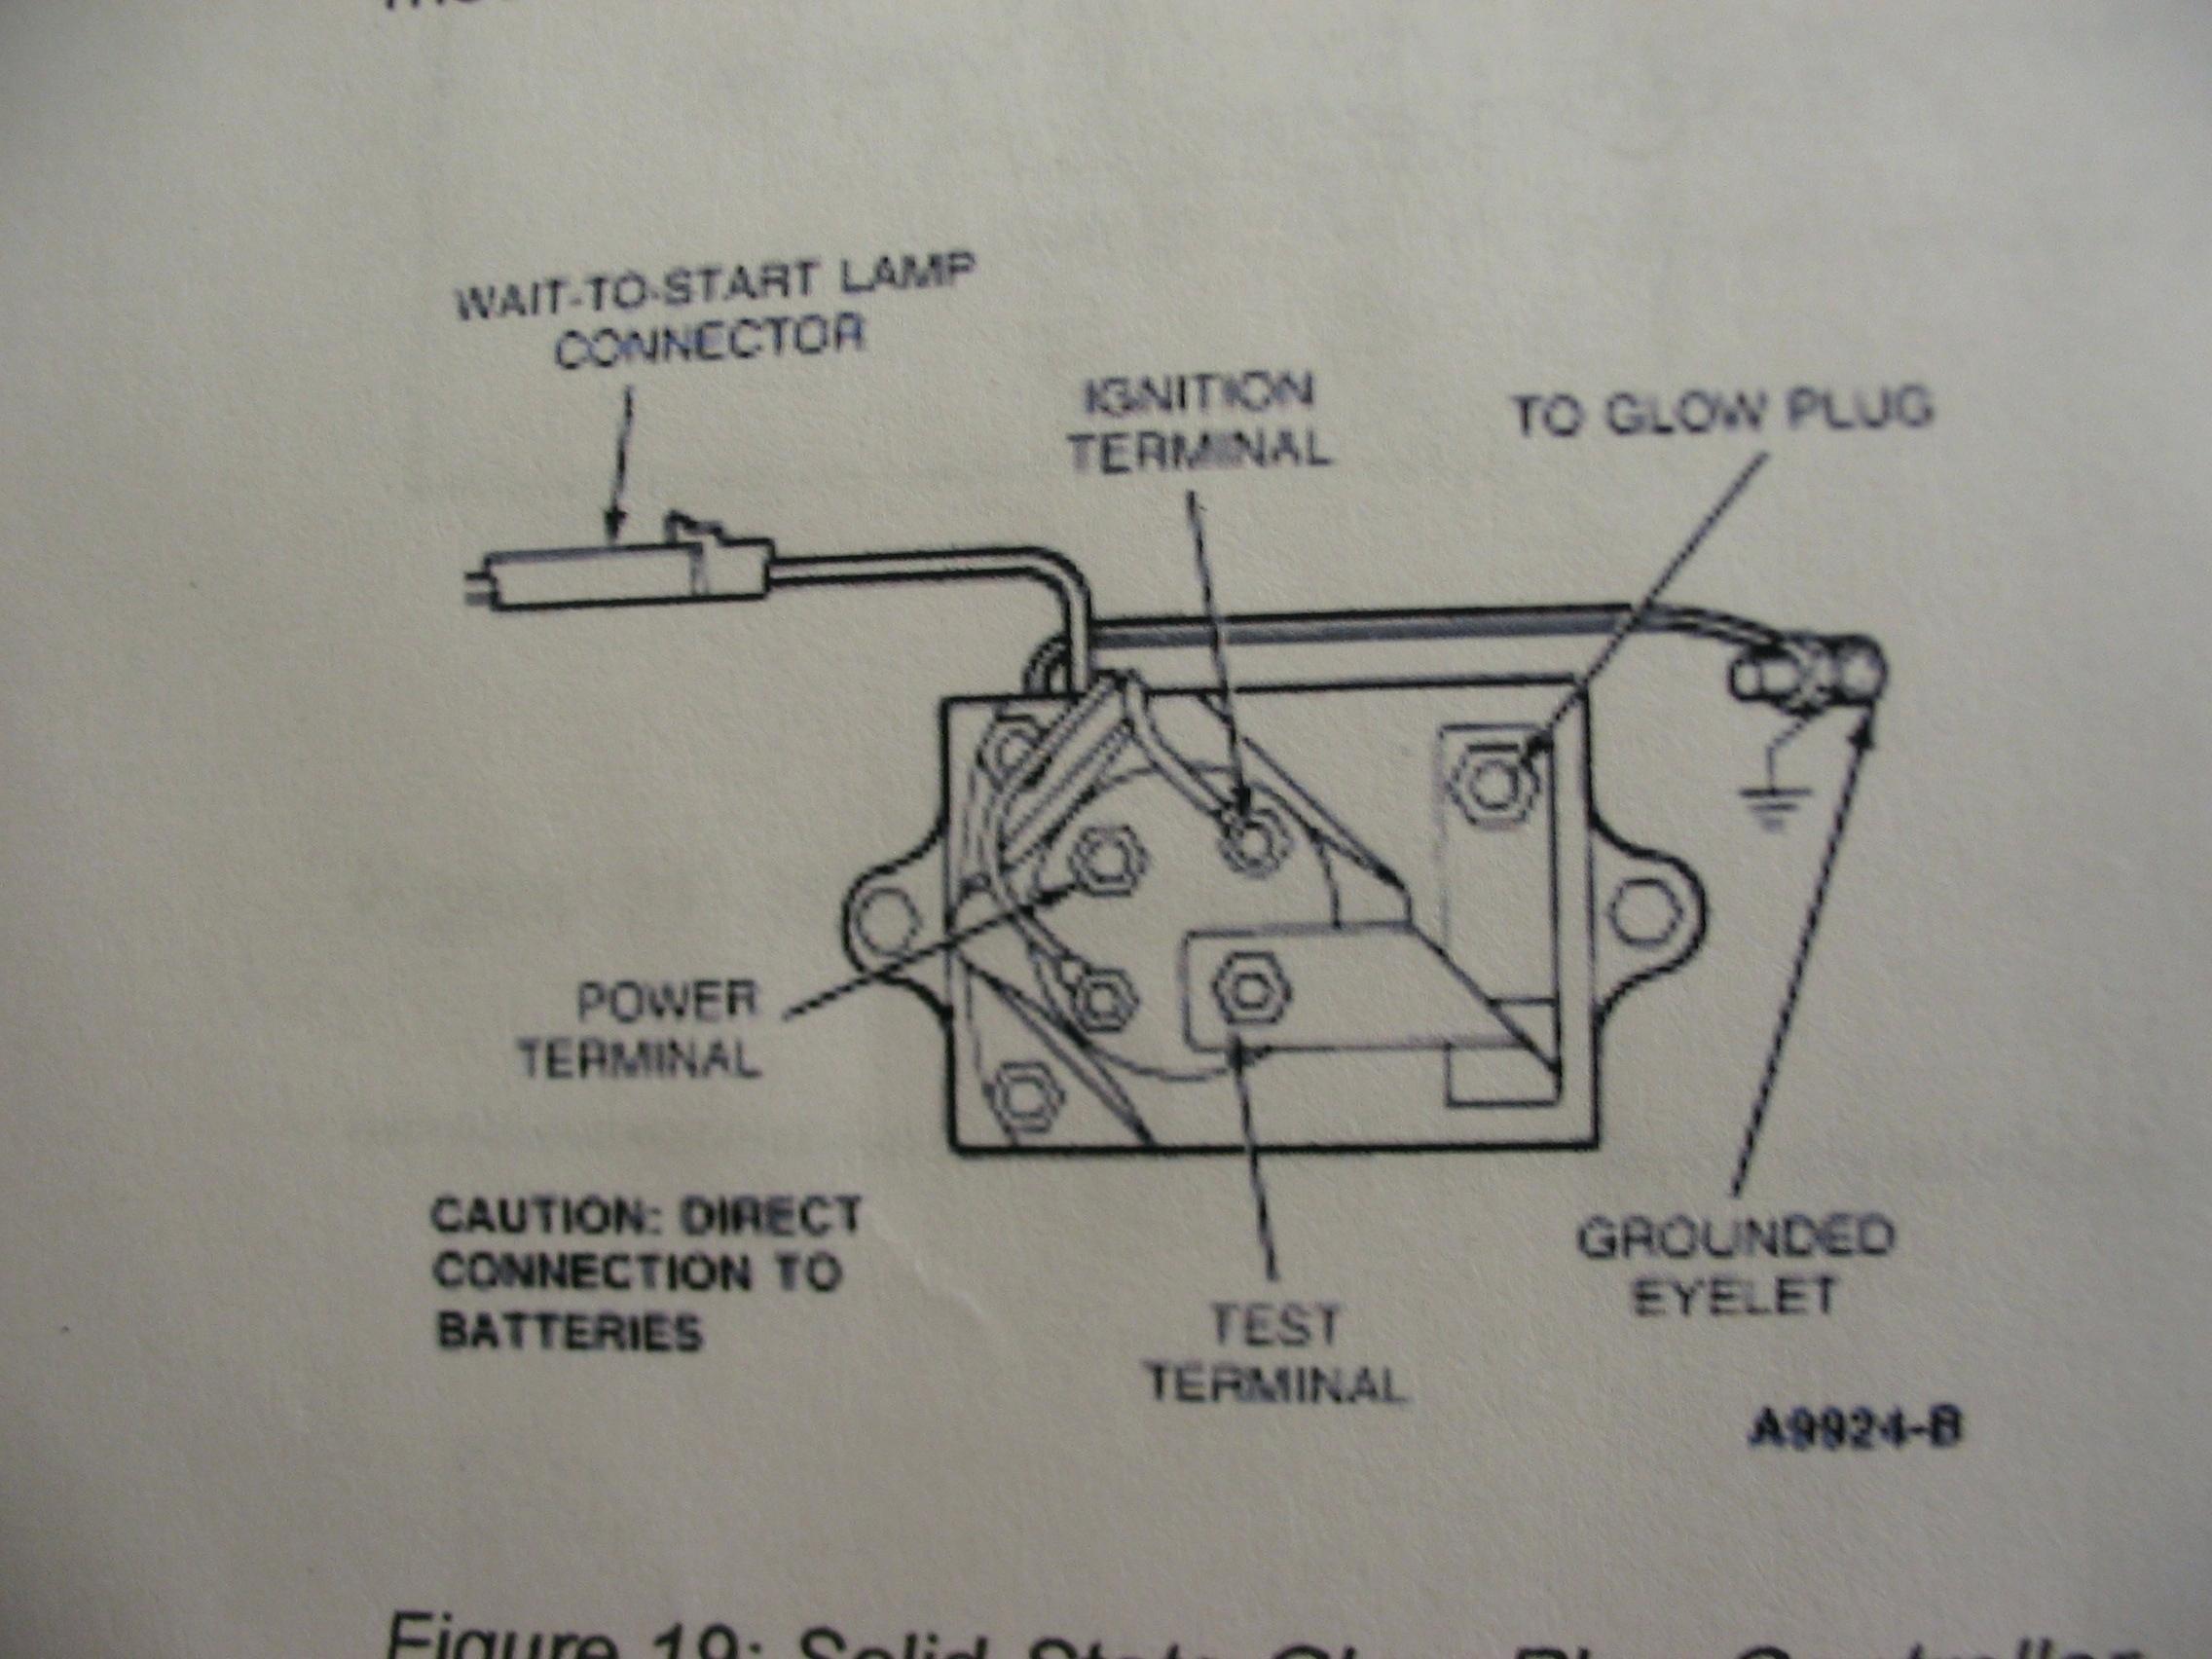 Xm 9135 1995 E350 Glow Plug Wiring Harness Download Diagram